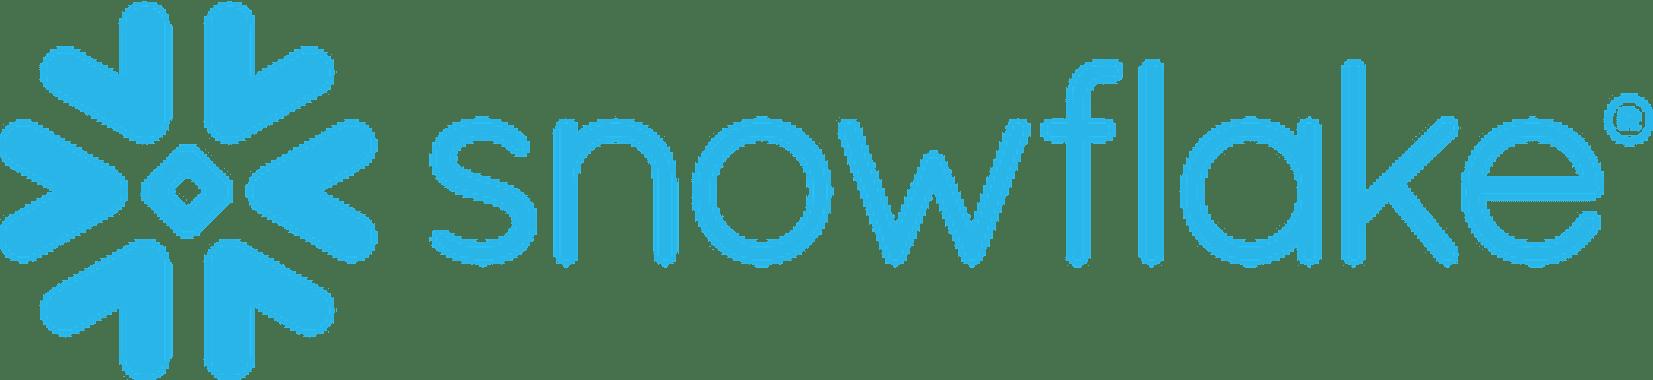 Snowflake Cloud Data Warehouse: Snowflake Data Warehouse